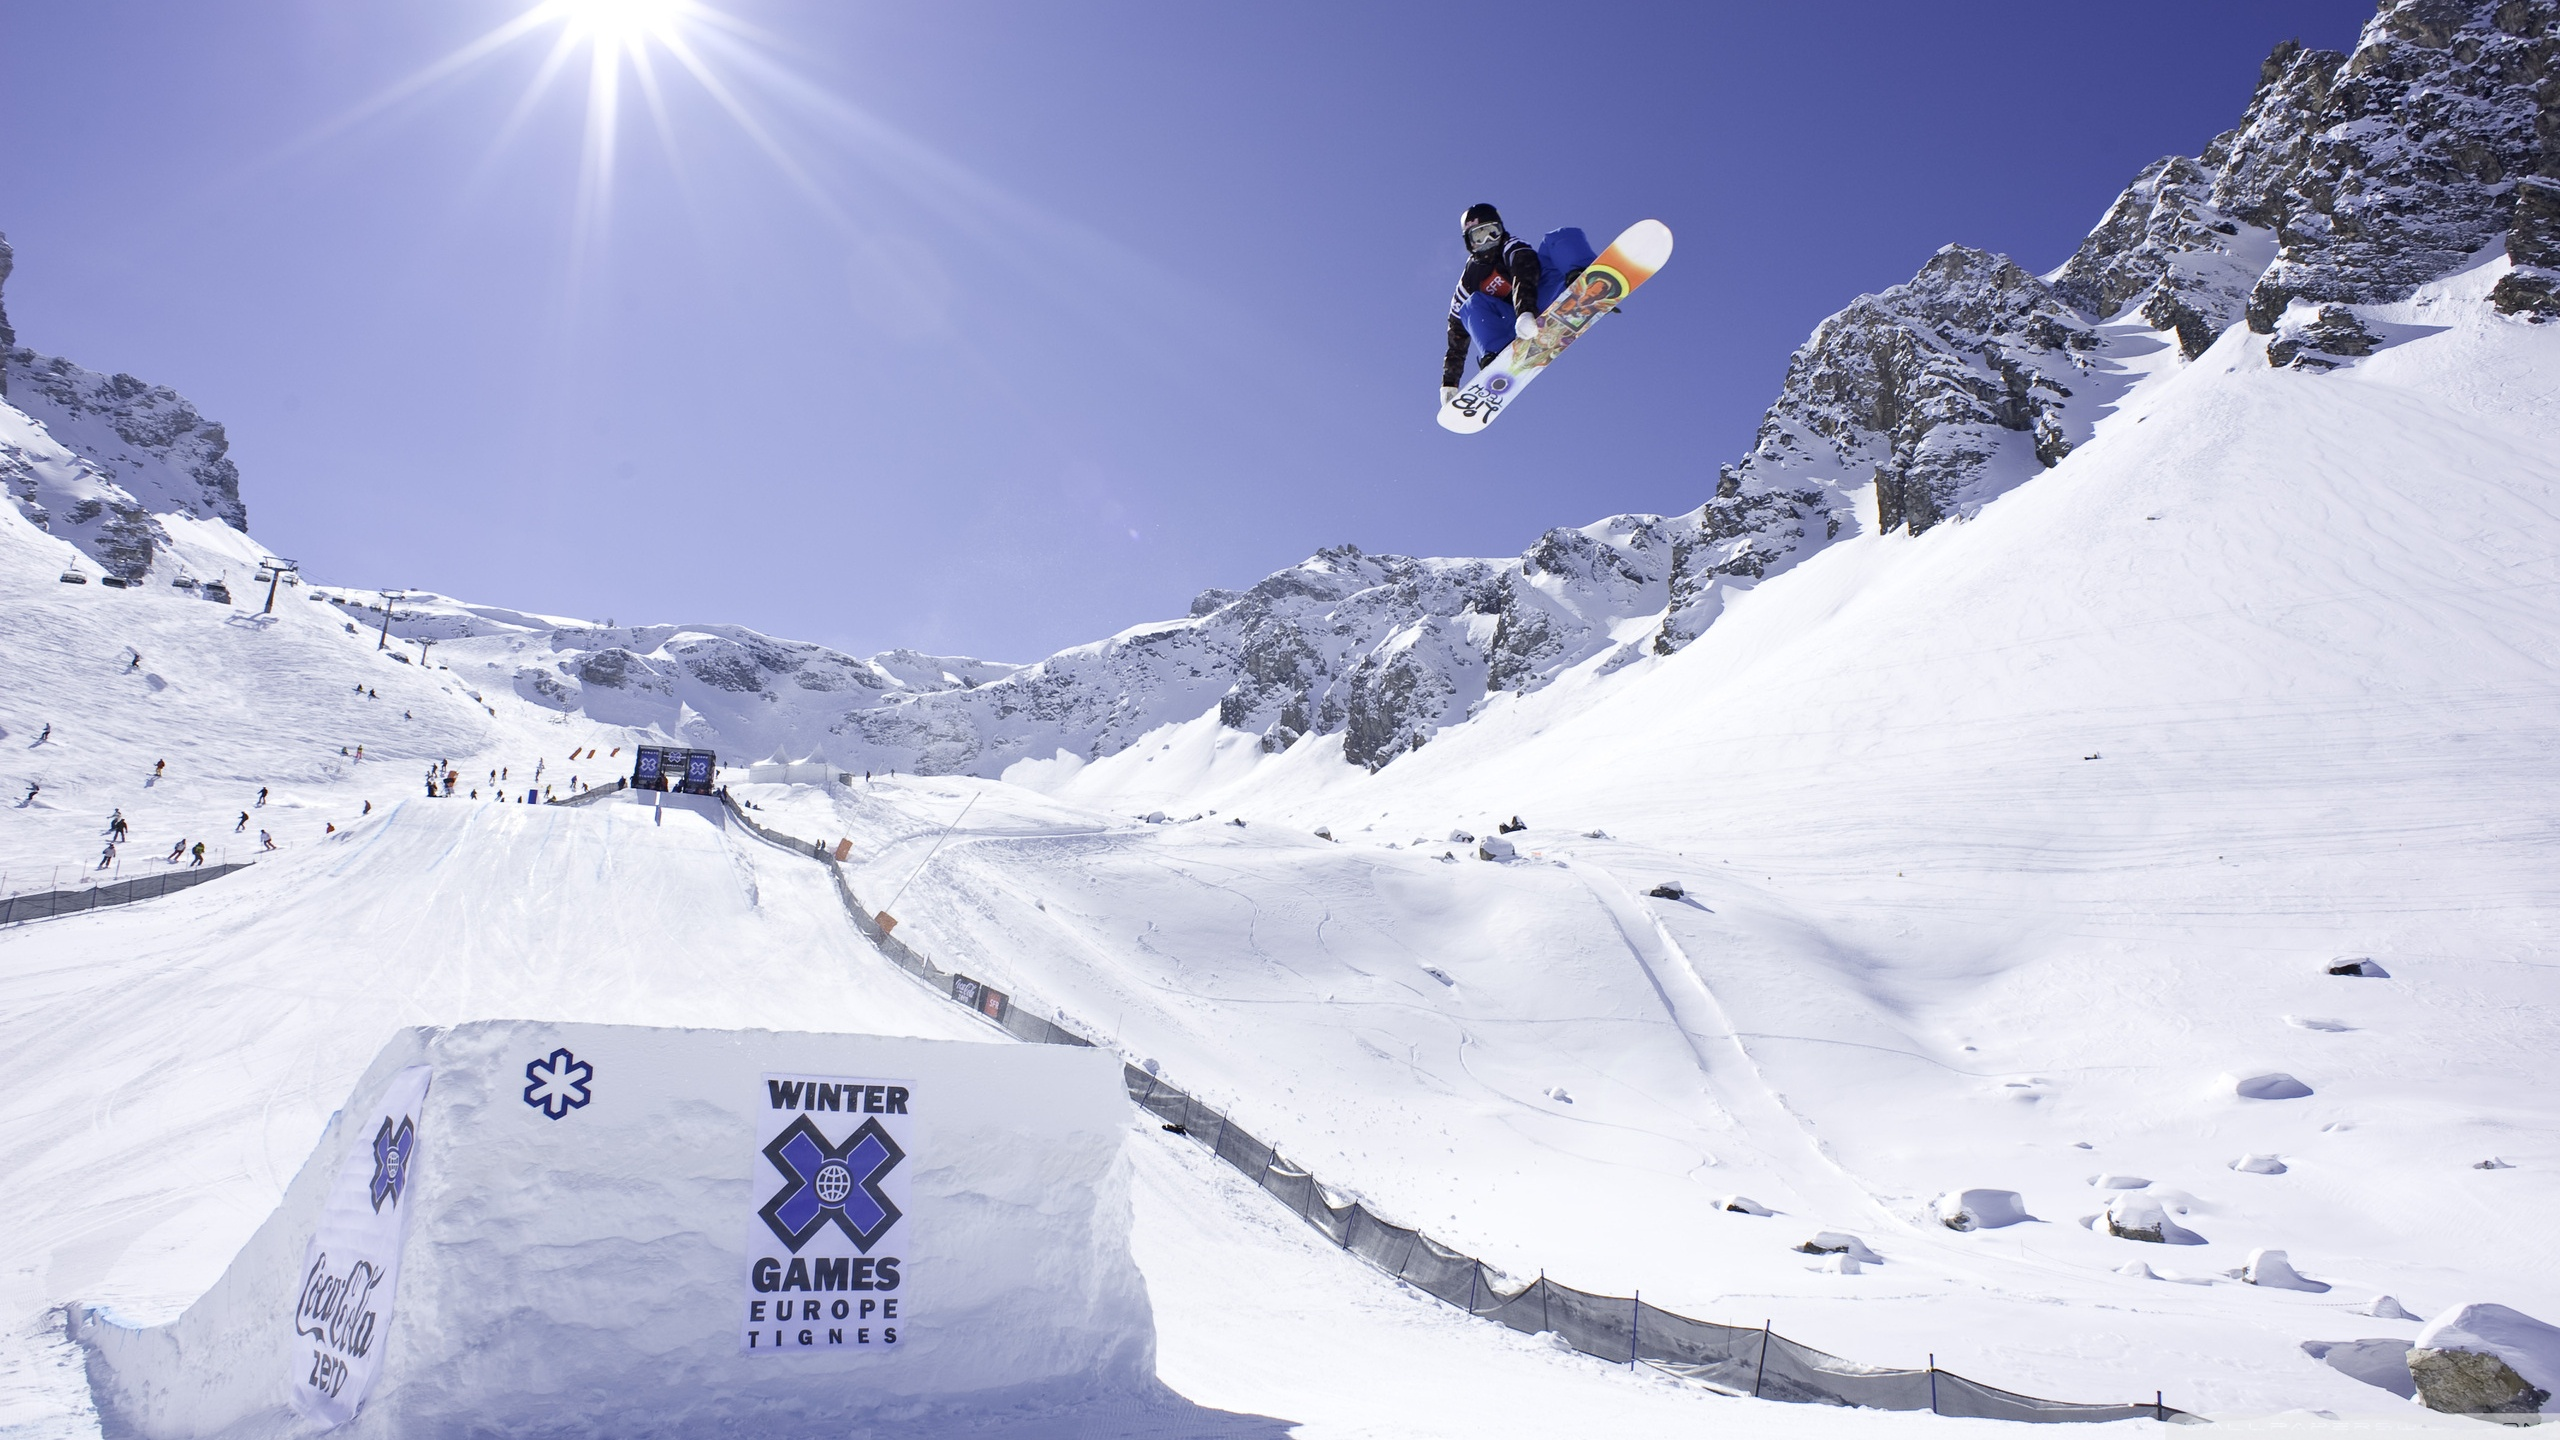 Winter Games Europe Tignes 4K HD Desktop Wallpaper for 4K Ultra 2560x1440